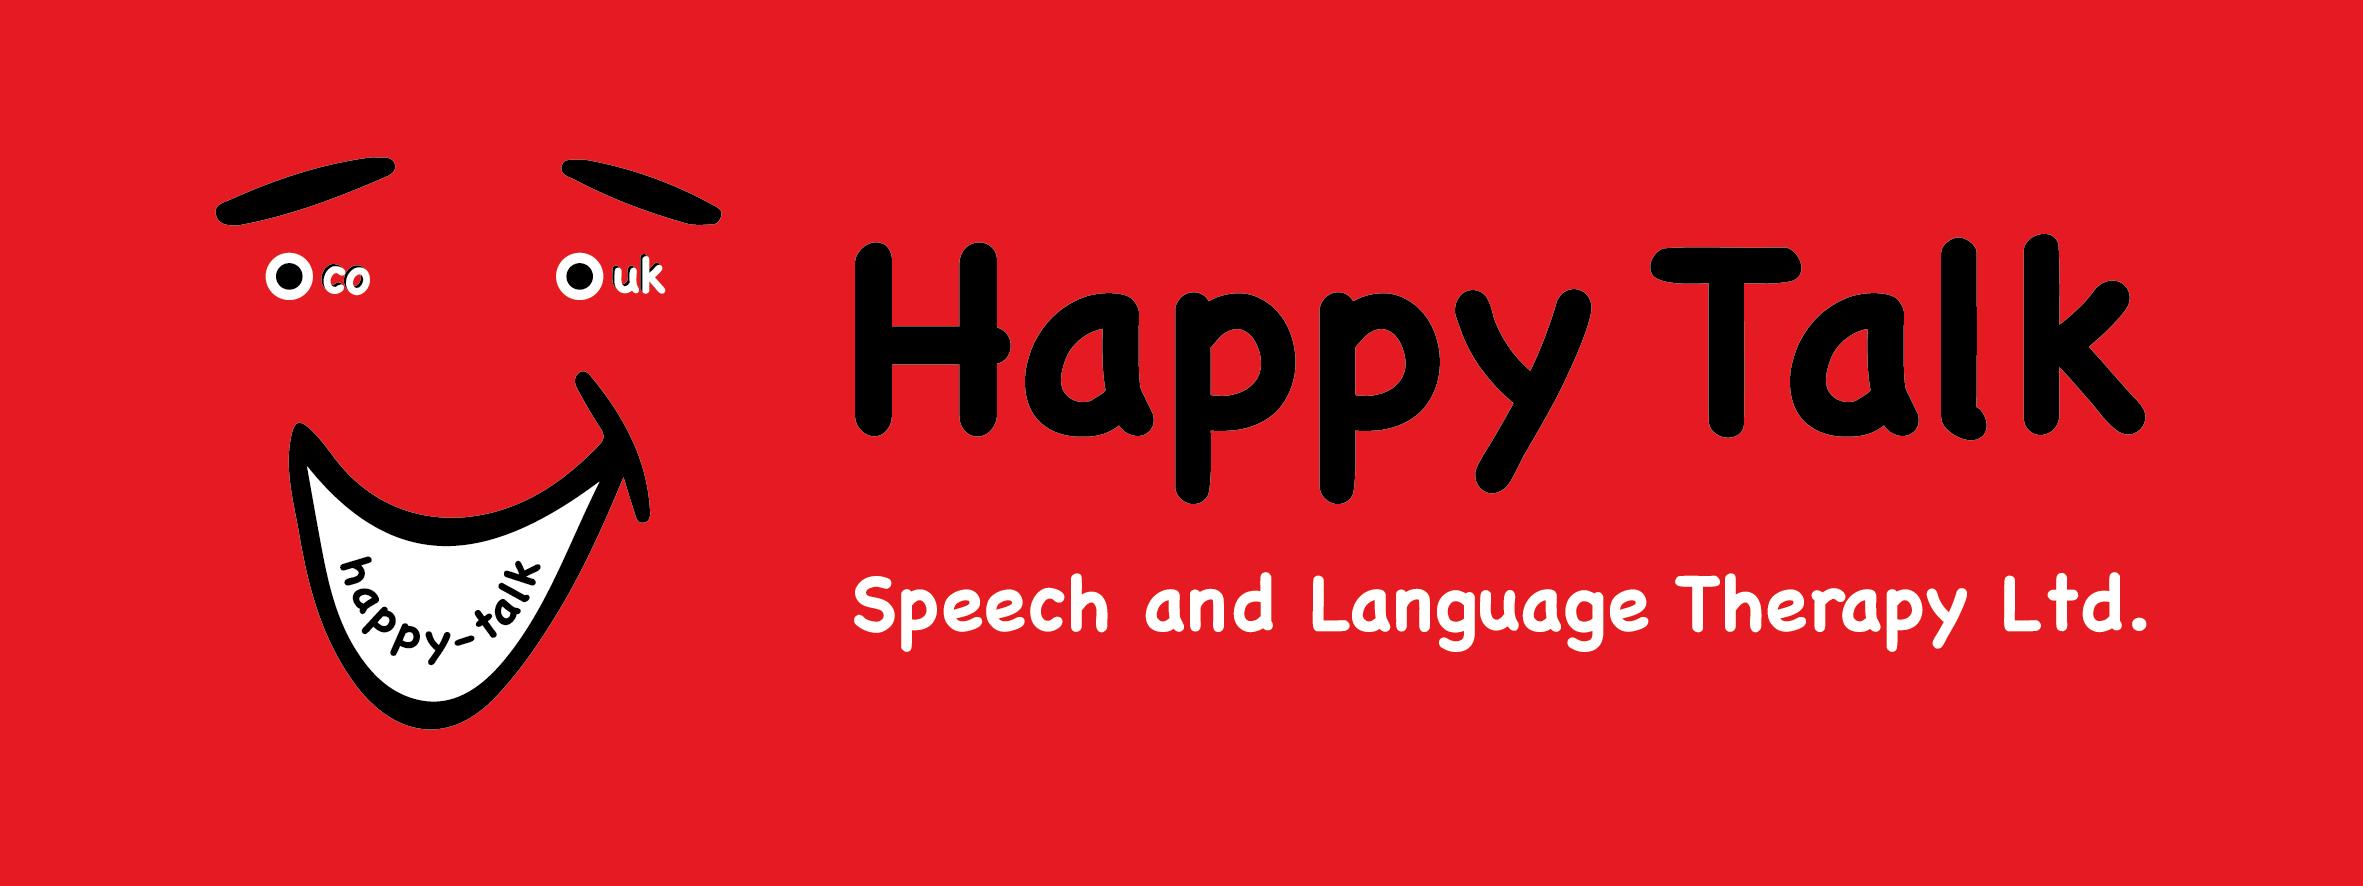 Happy Talk